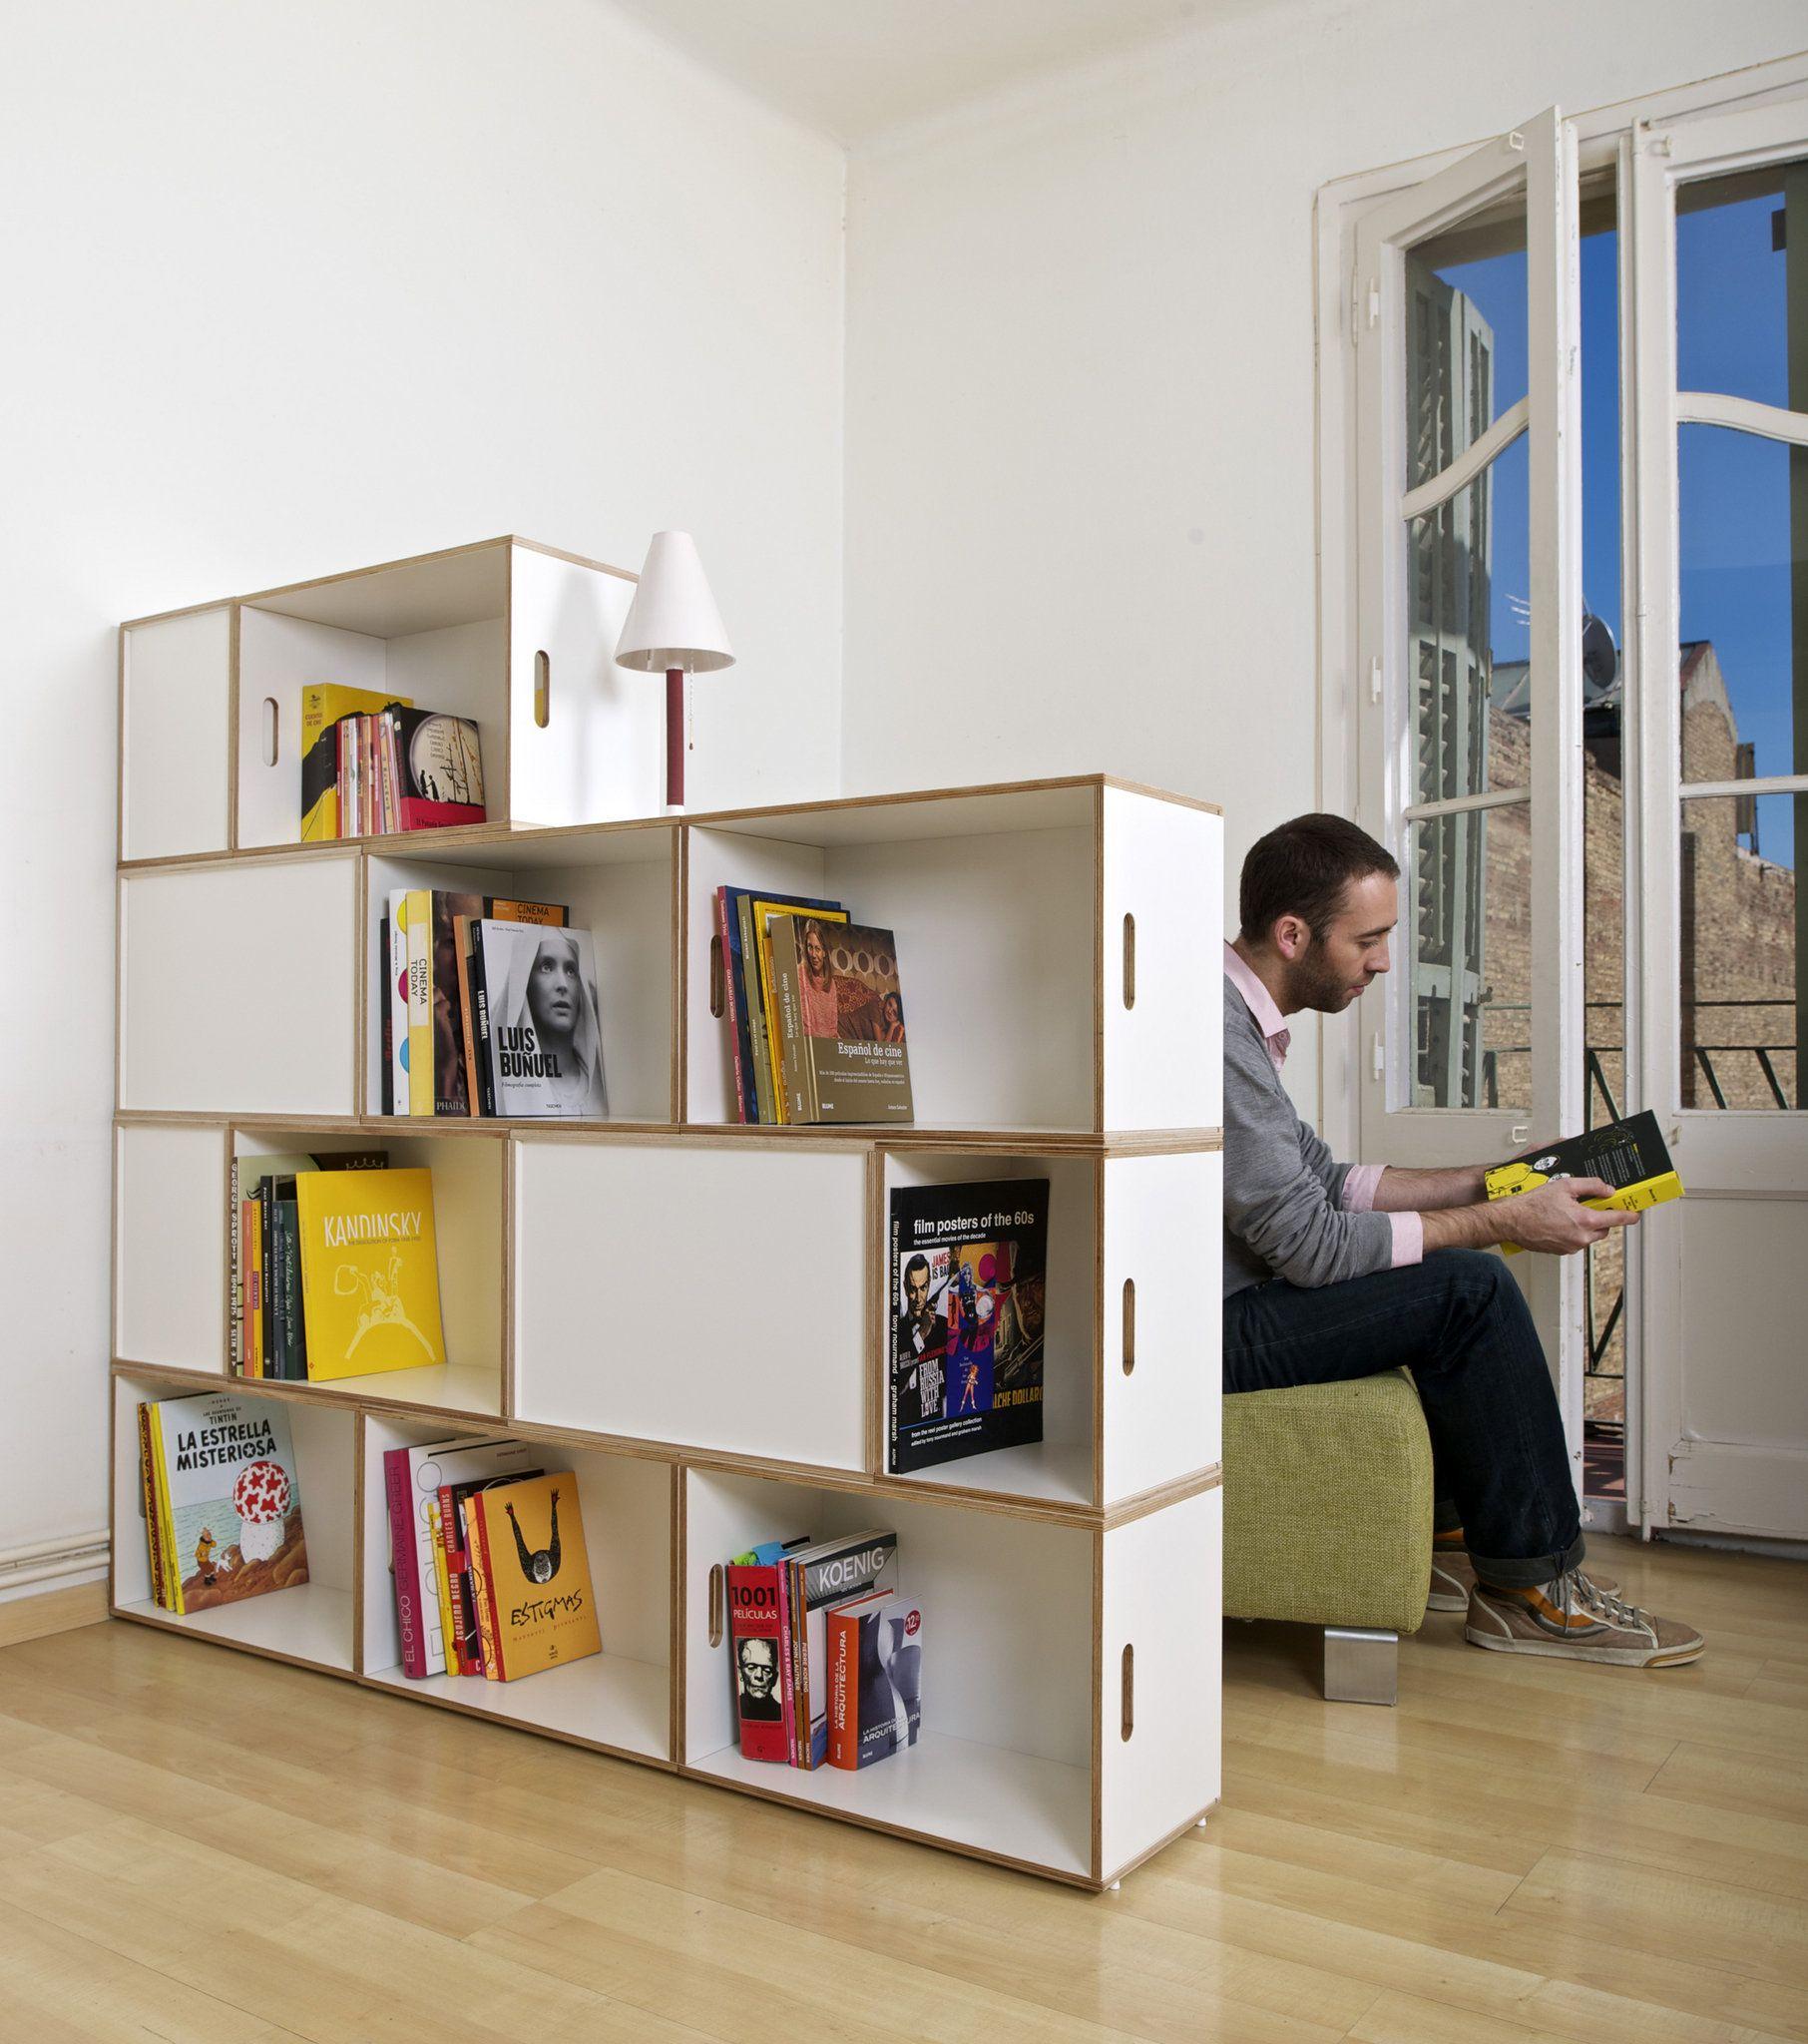 Dividing Storage Wall Kids Bookcase Furniture Bookshelf Ikea Floating Corner Room Divider Shelves Small Bookshelves